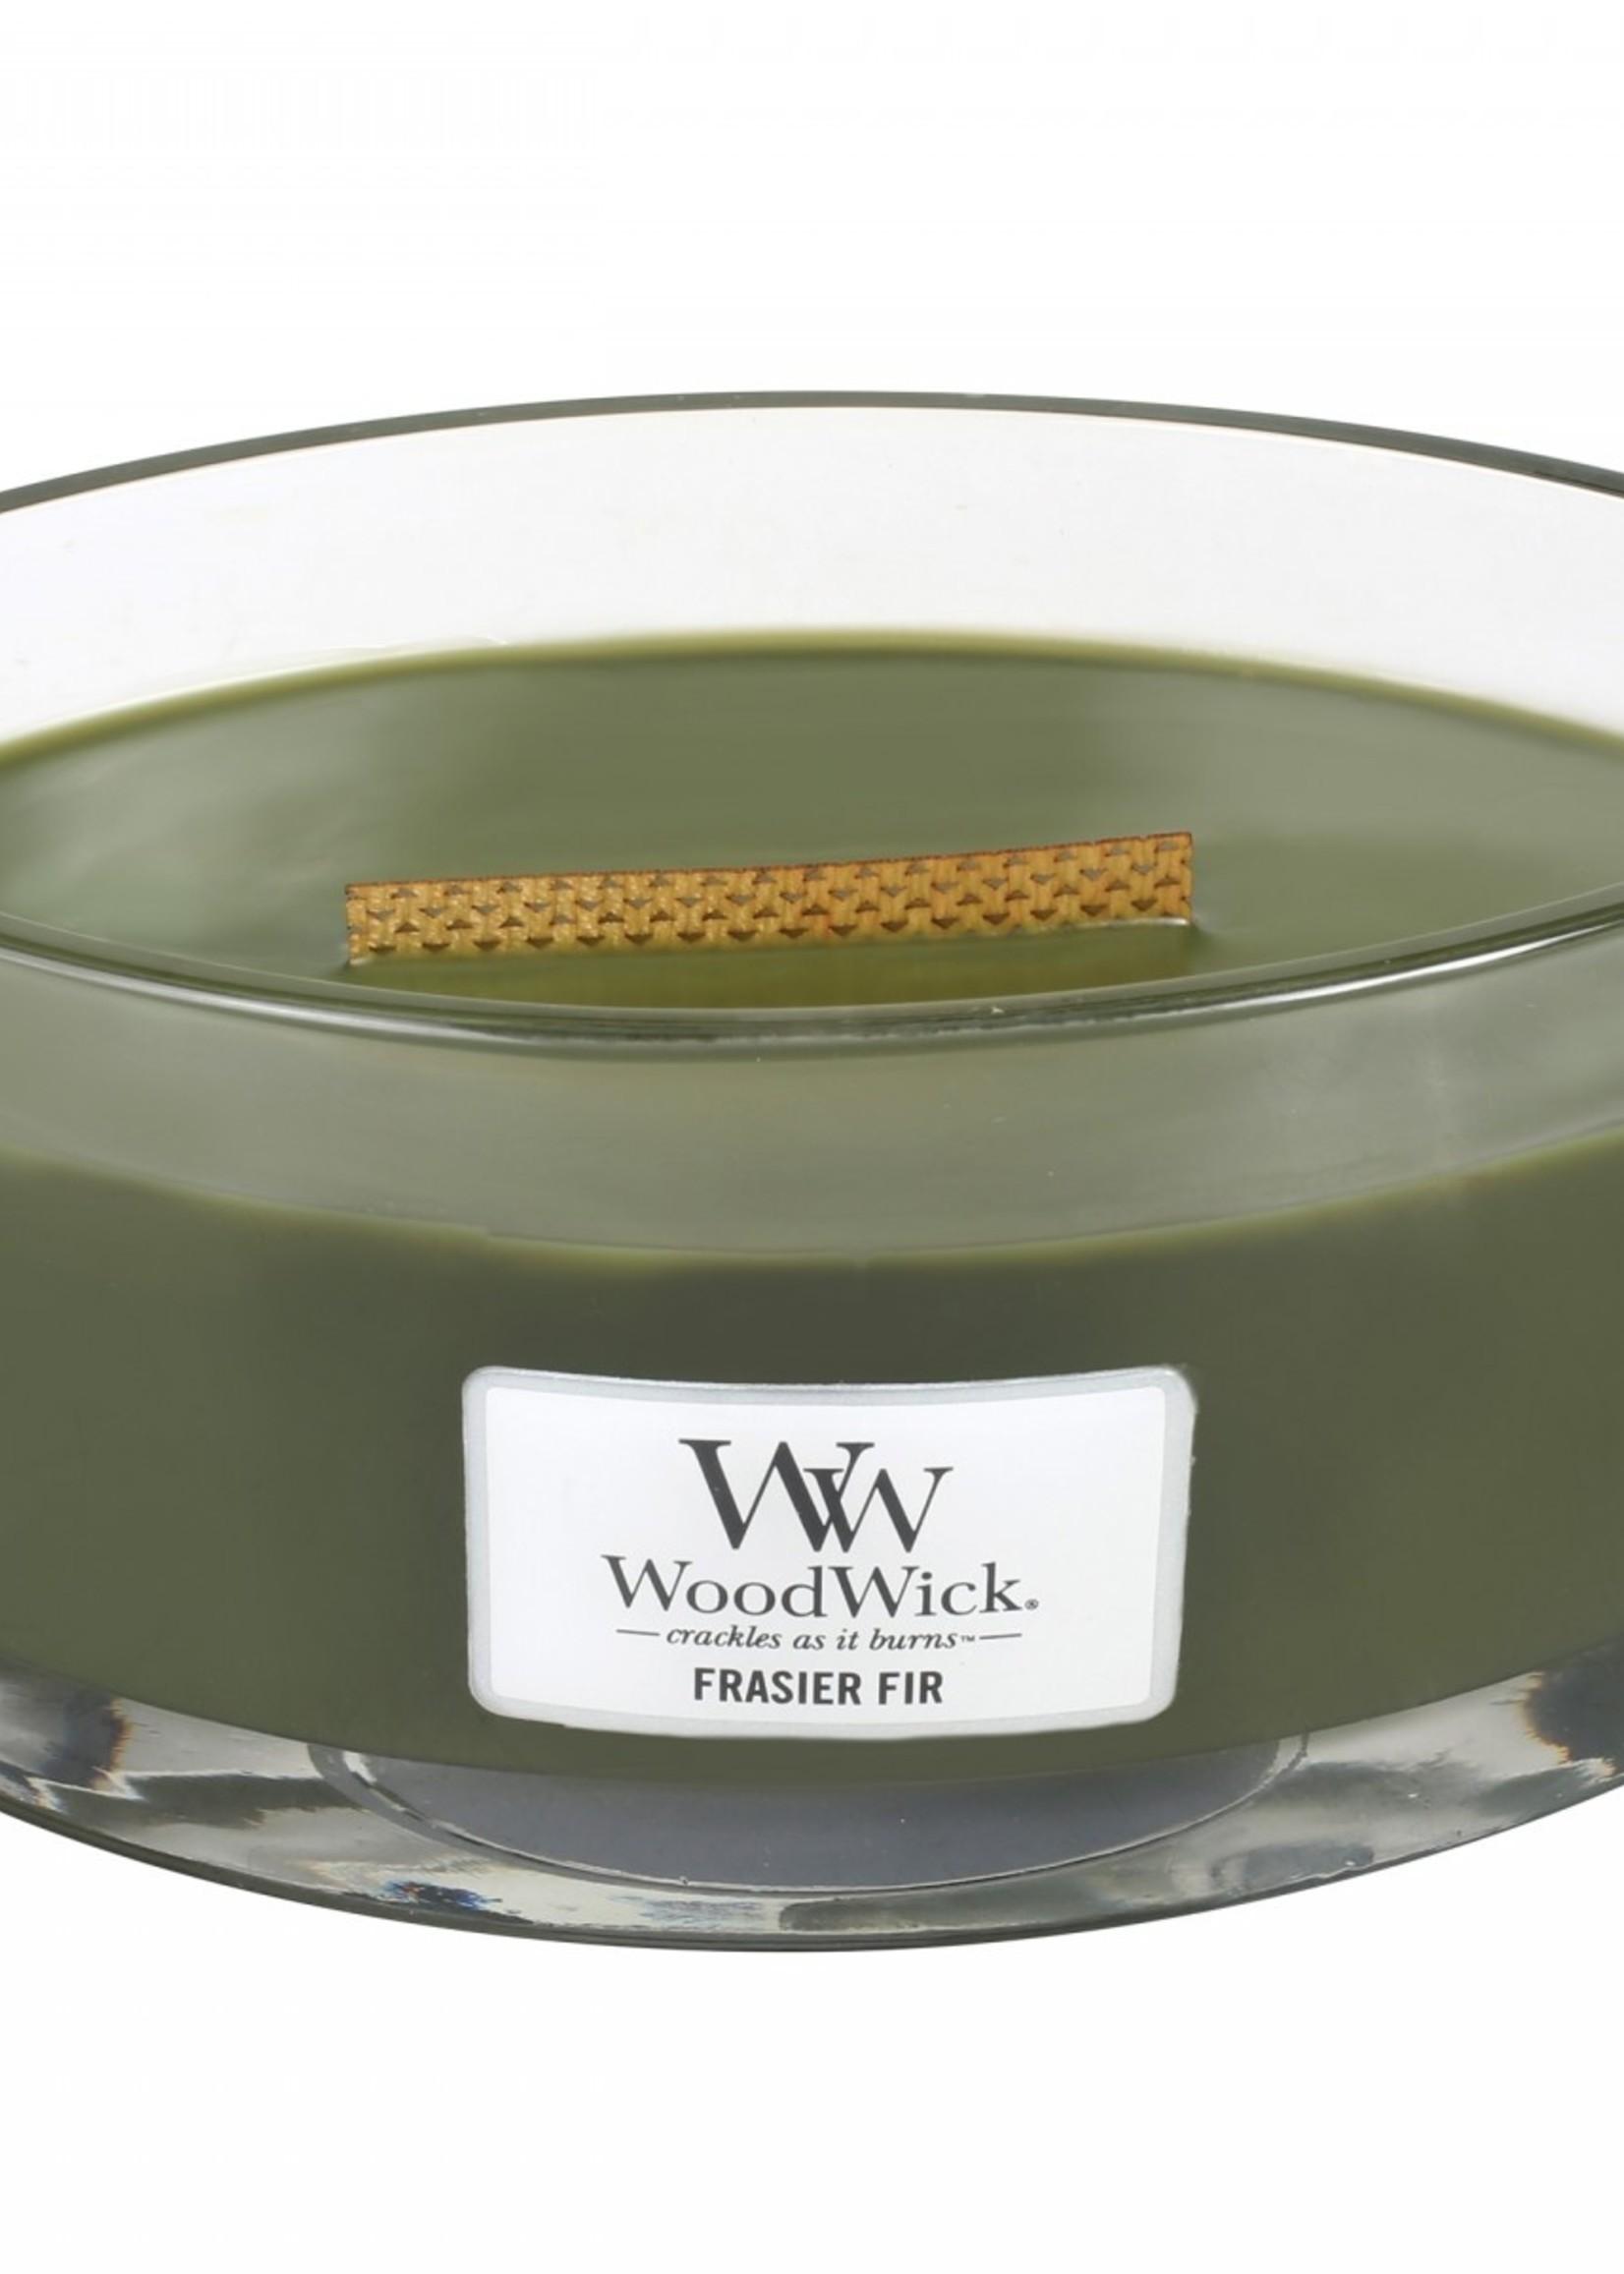 Woodwick Woodwick Frasier Fir Ellipse Candle